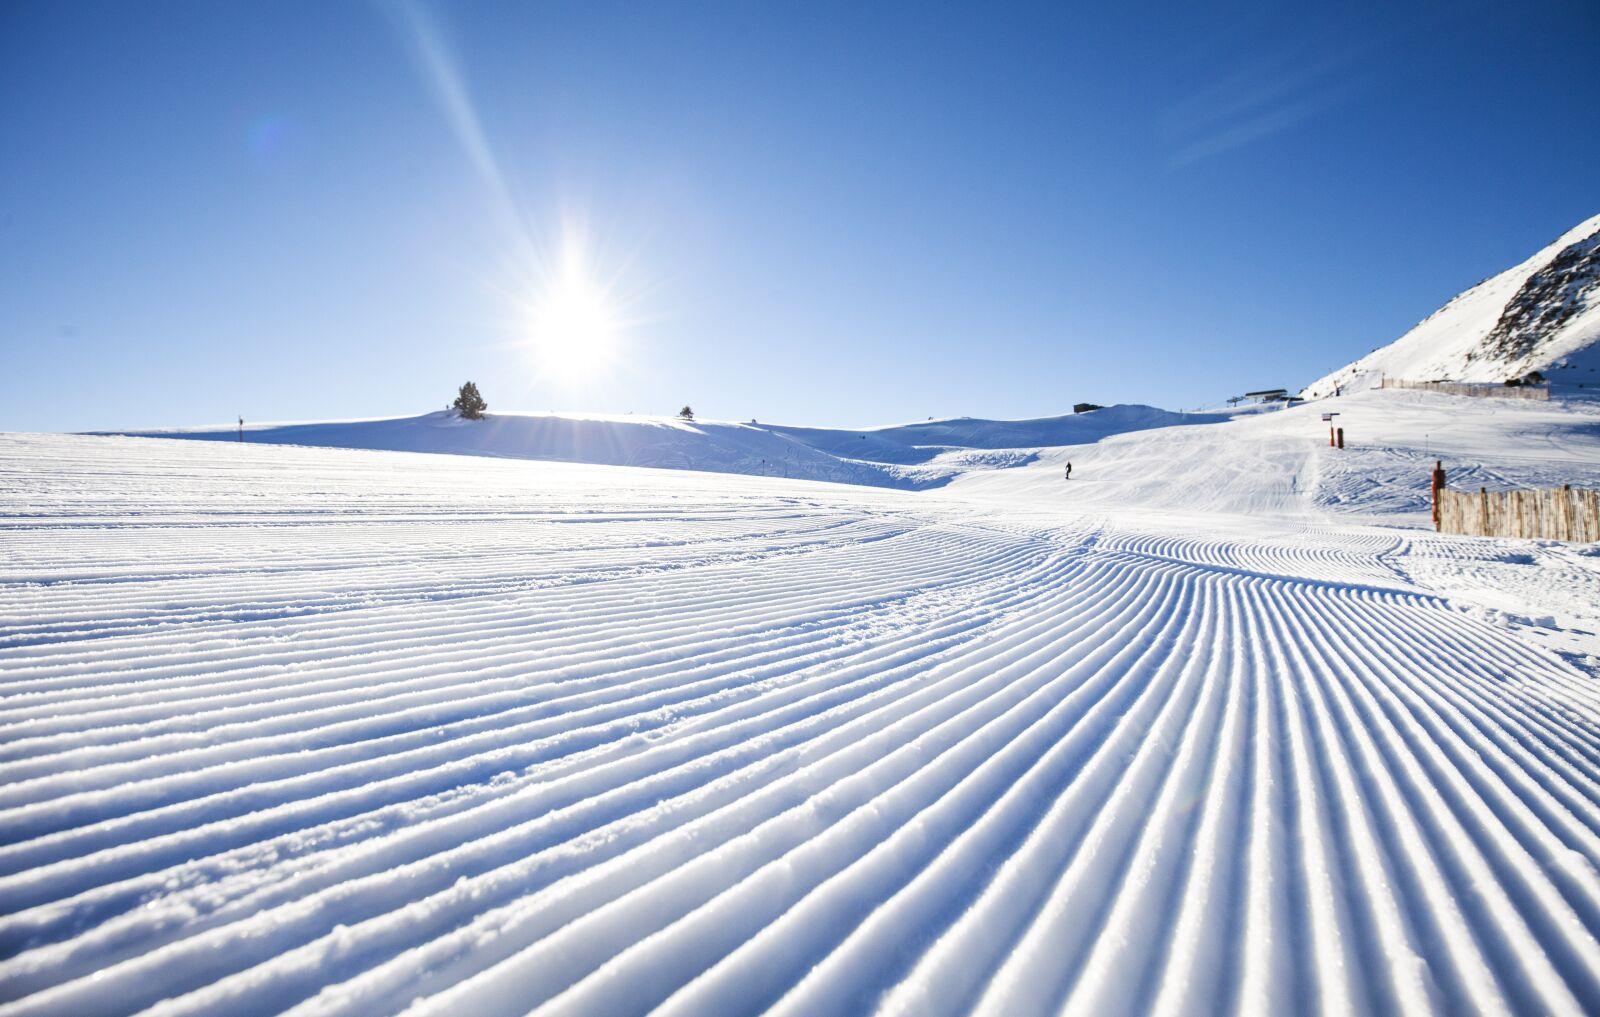 snow, mountain, ski, Canon EOS 5D MARK II, Canon EF16-35mm f/4L IS USM